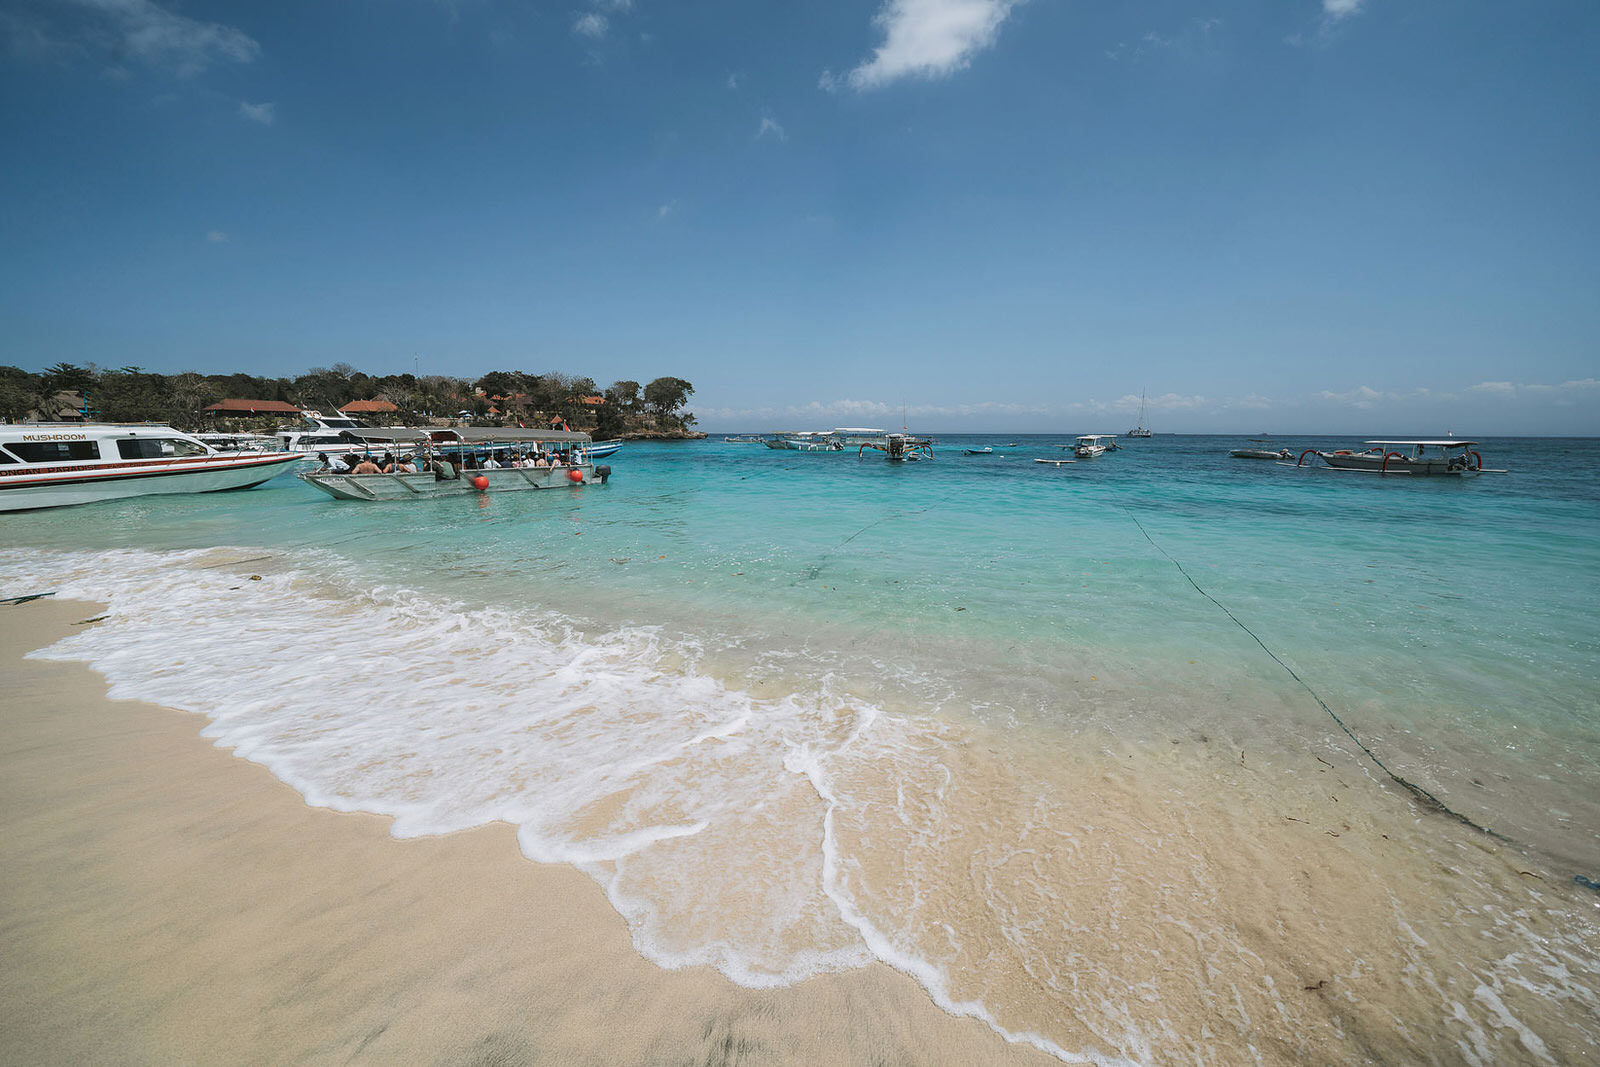 newfound-hai-tide-nusa-lembongan-bali-wedding-photographers-002